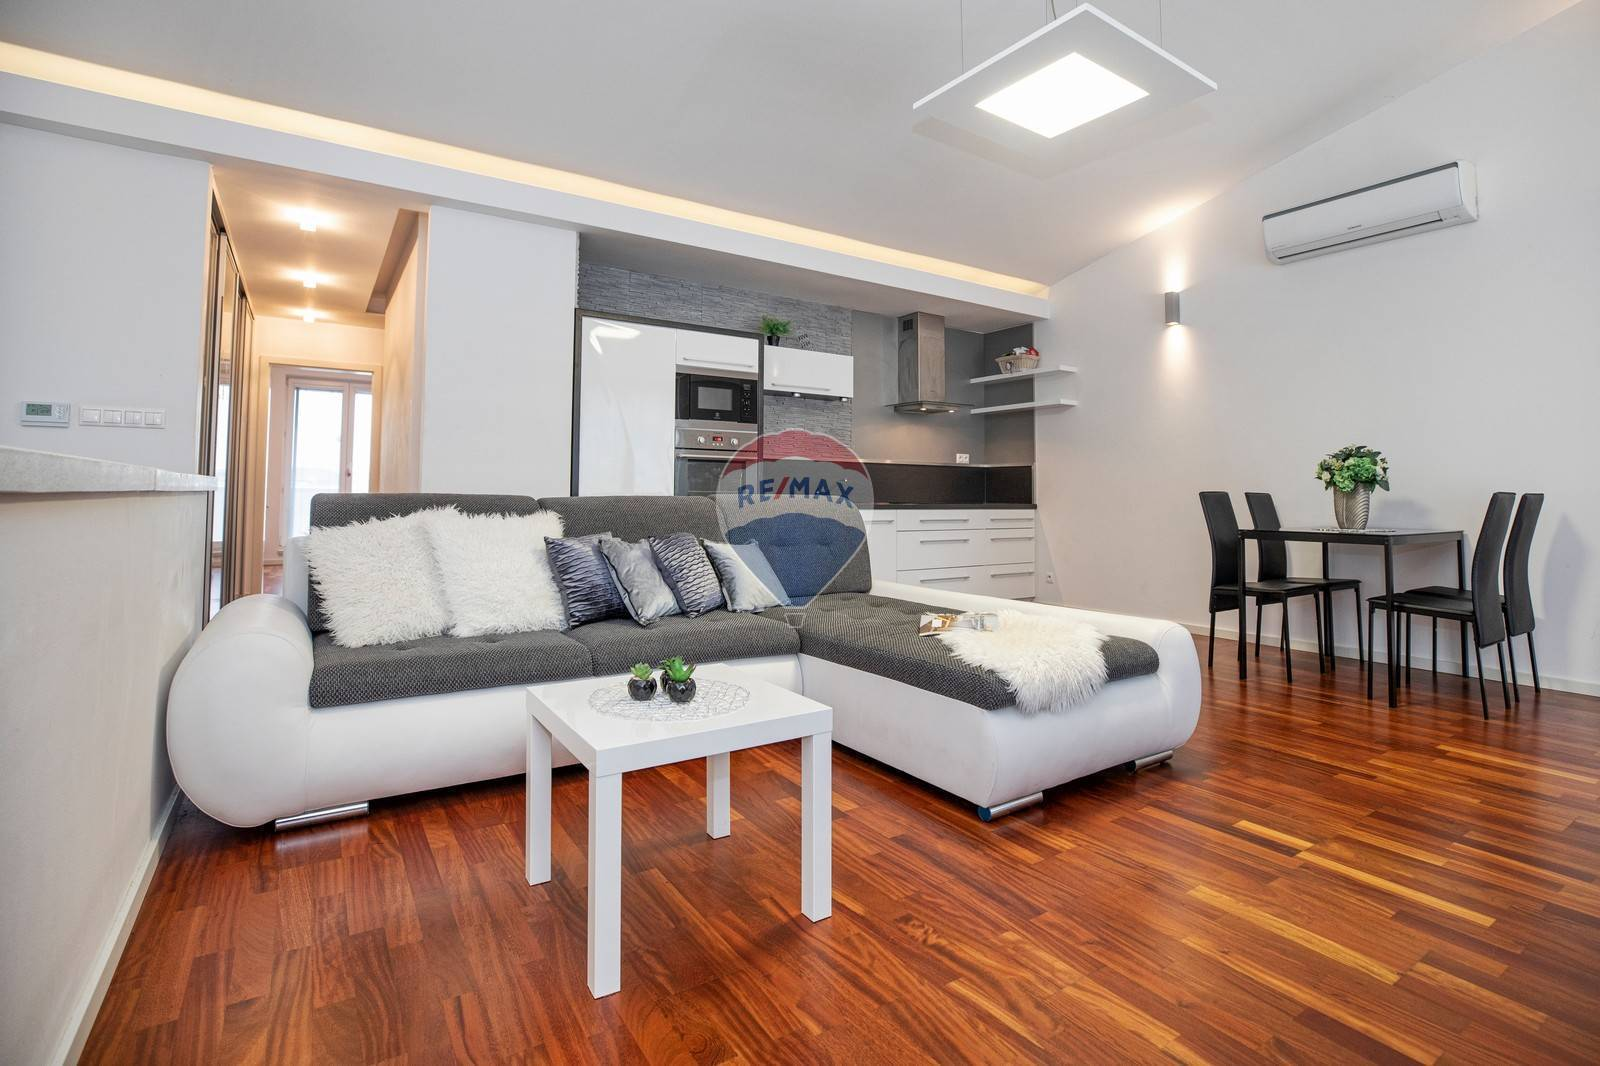 Predaj 3-izboveho mezonetoveho bytu v Malinove